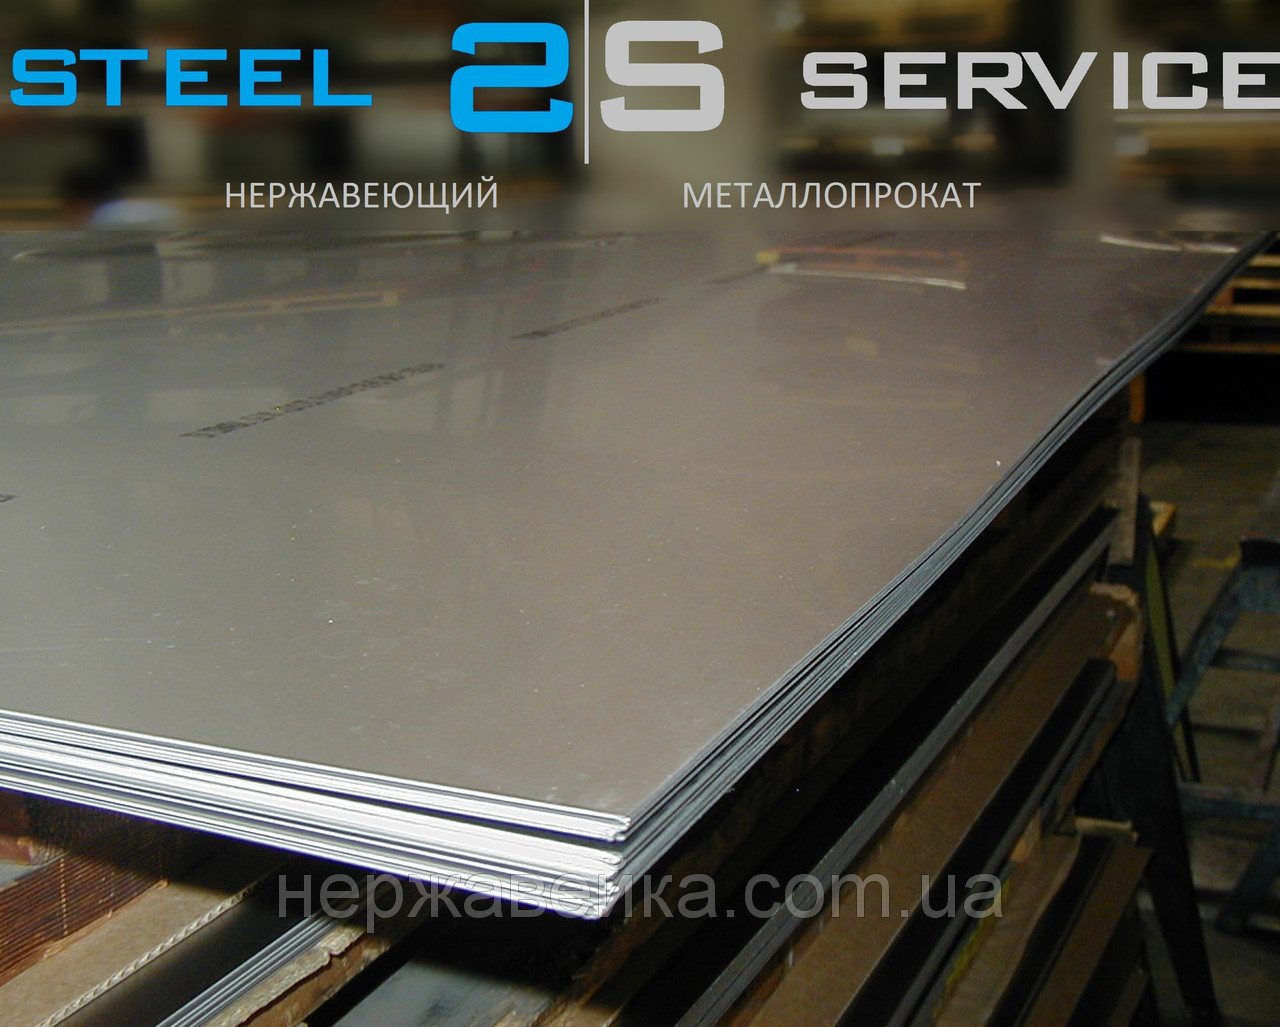 Нержавейка лист 1,5х1500х3000мм AISI 430(12Х17) 2B - матовый, технический